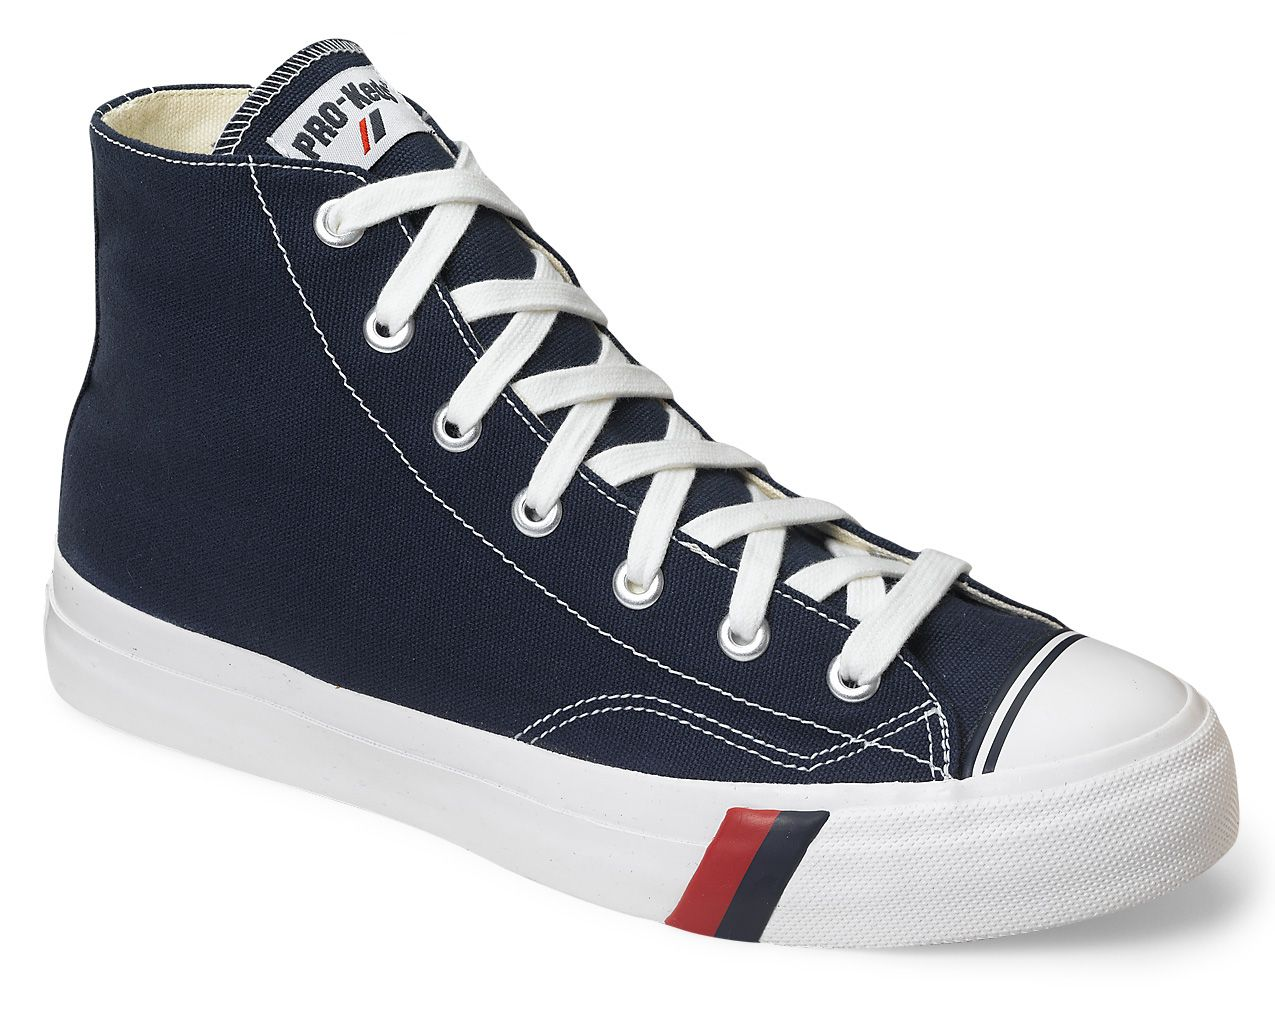 1970s pro keds basketball shoes